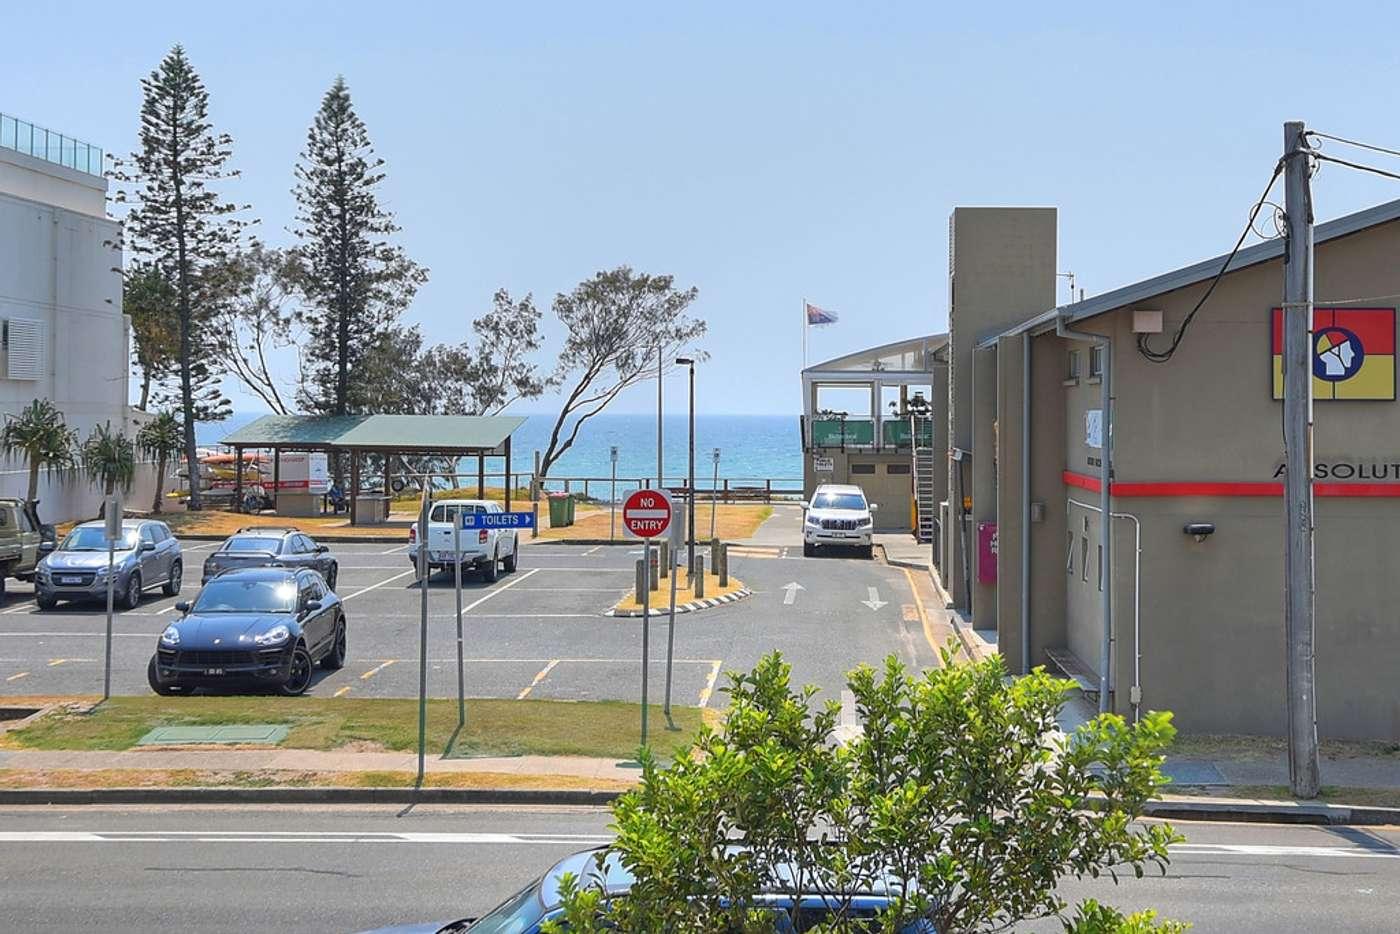 Main view of Homely apartment listing, 5/26 Albatross Avenue, Mermaid Beach QLD 4218